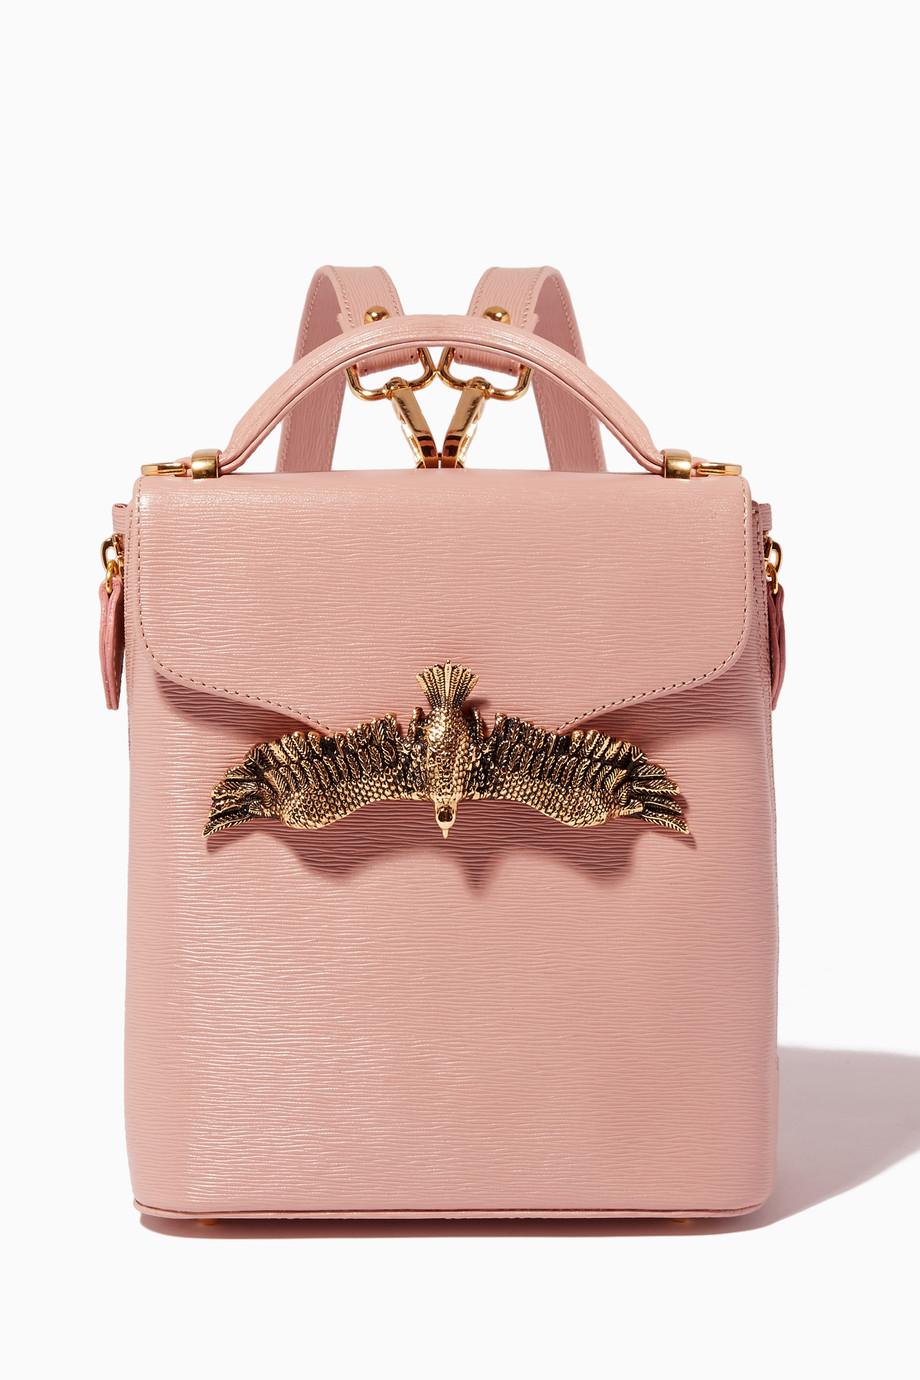 87374d34c9 Shop Moni   J Neutral Nude Mini Lizard-Effect Leather Backpack for ...